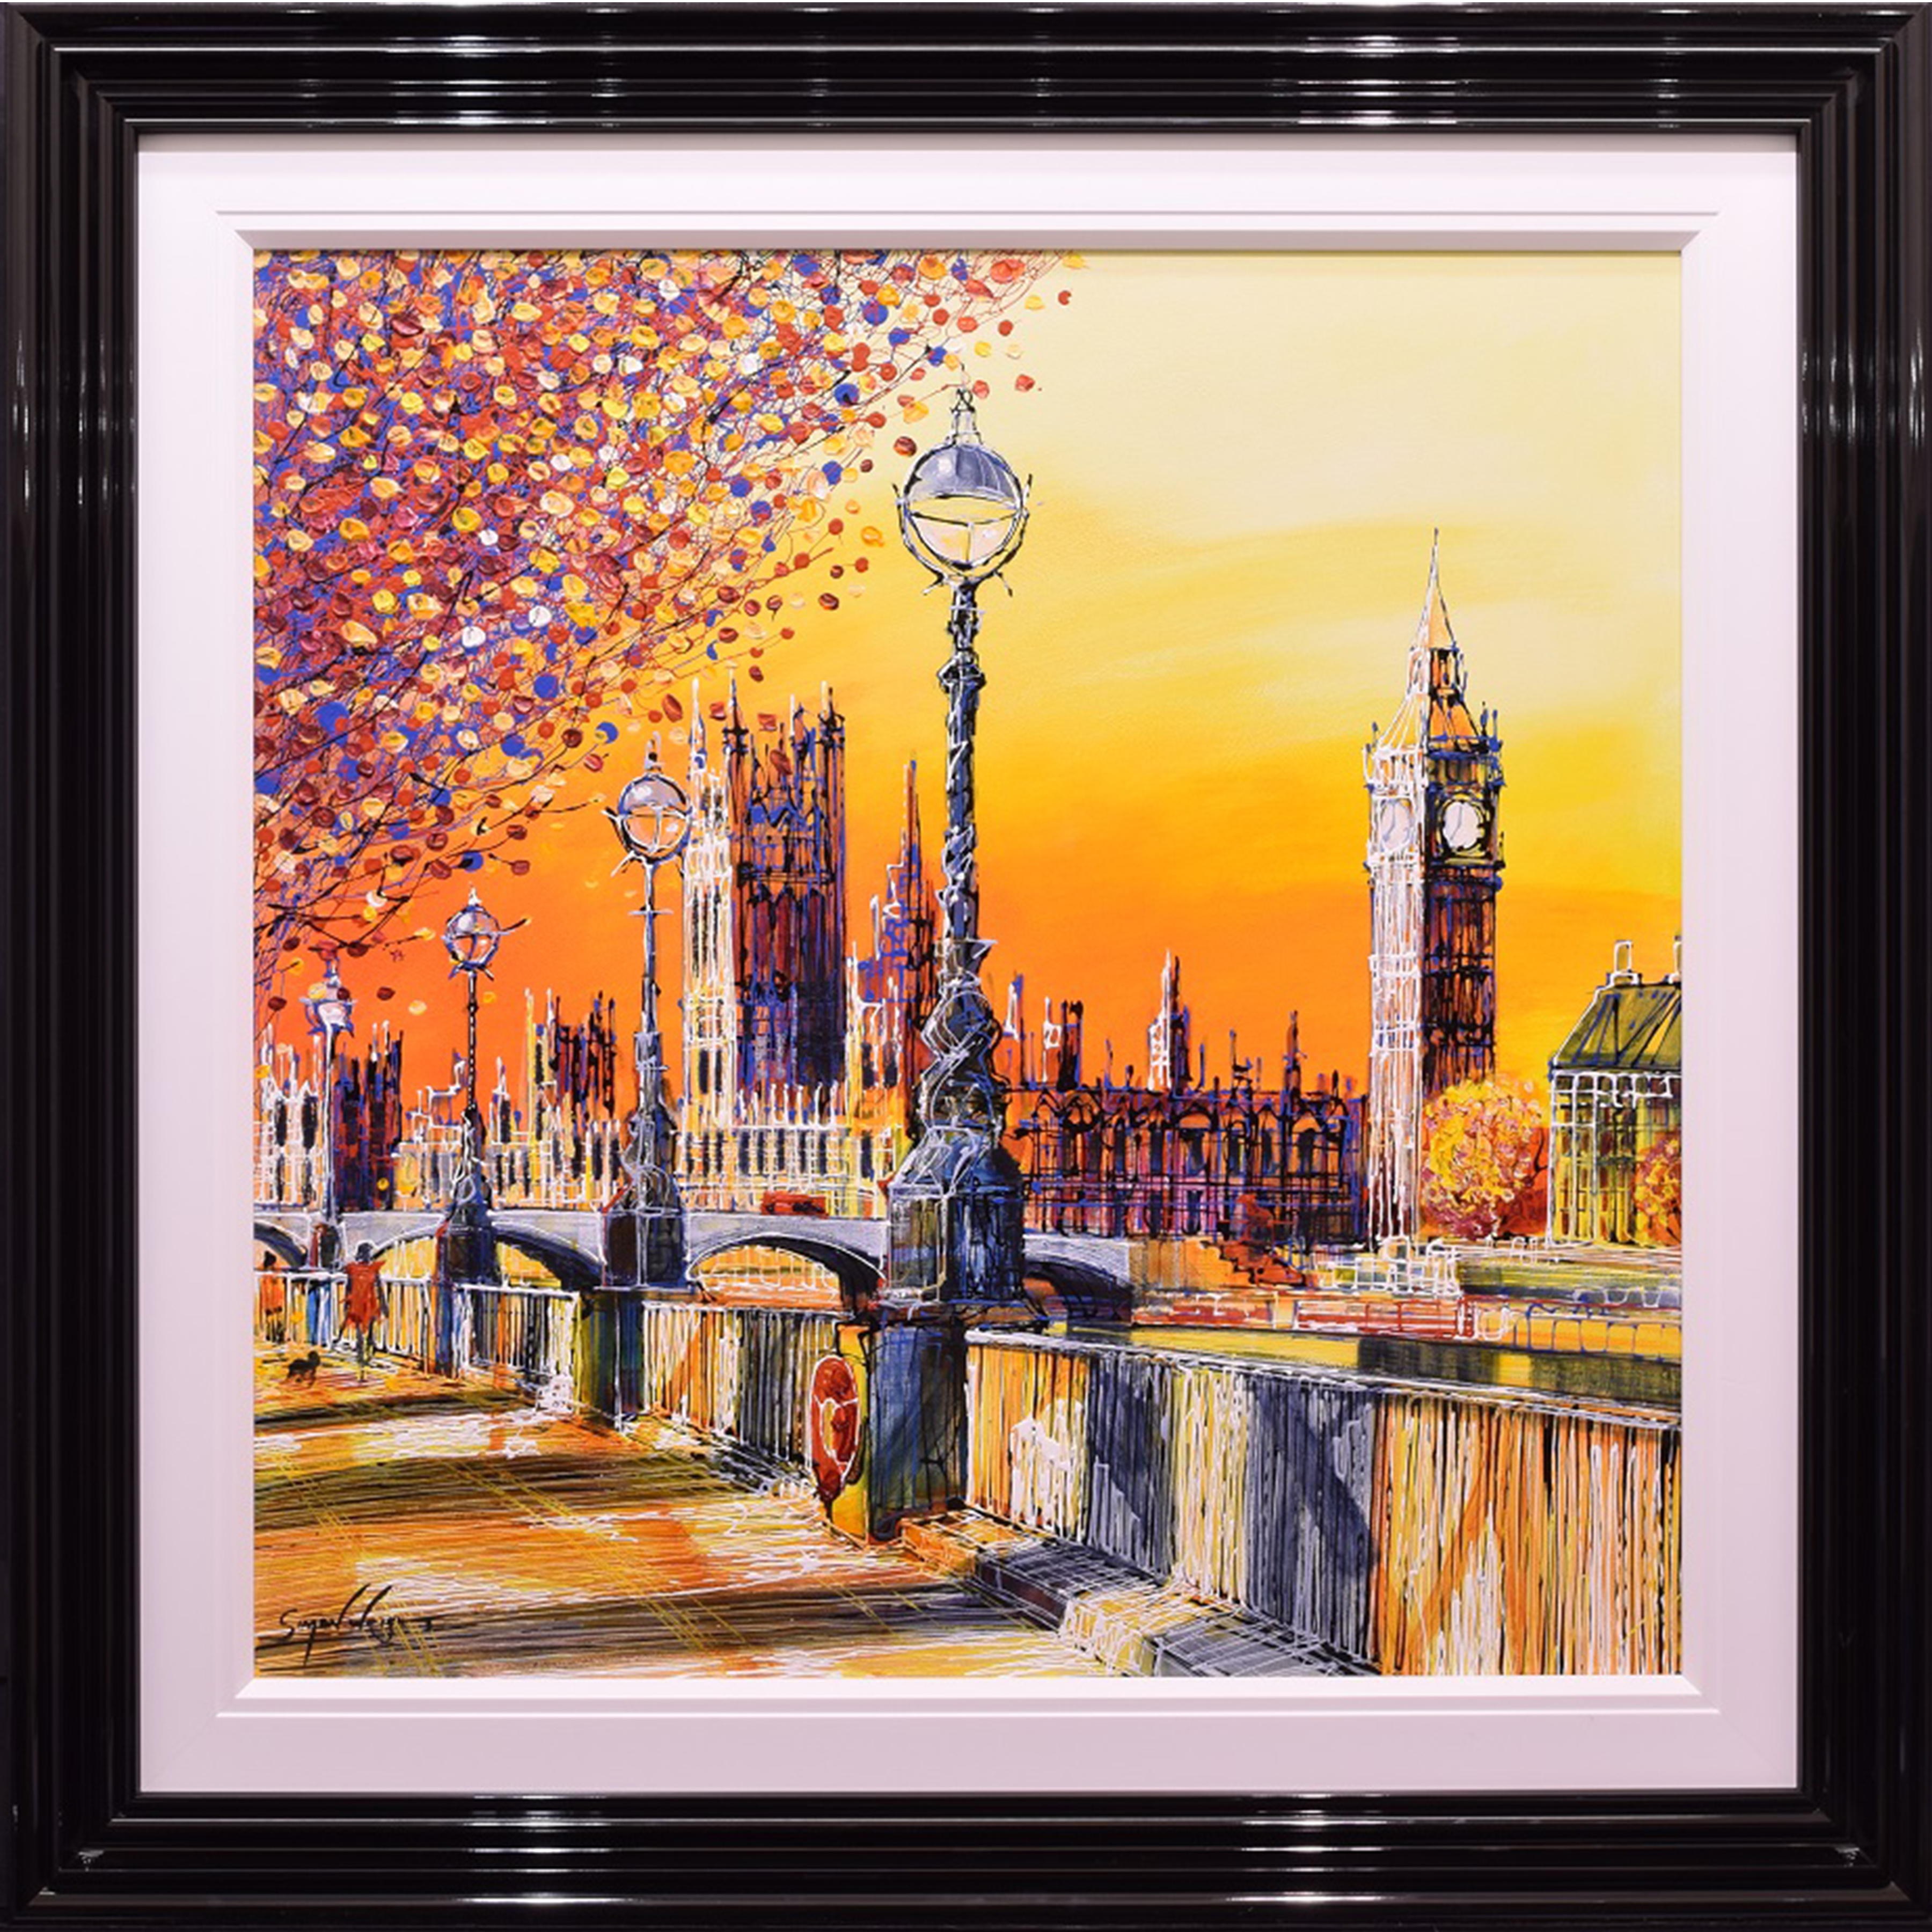 Sunset Embankment by Simon Wright